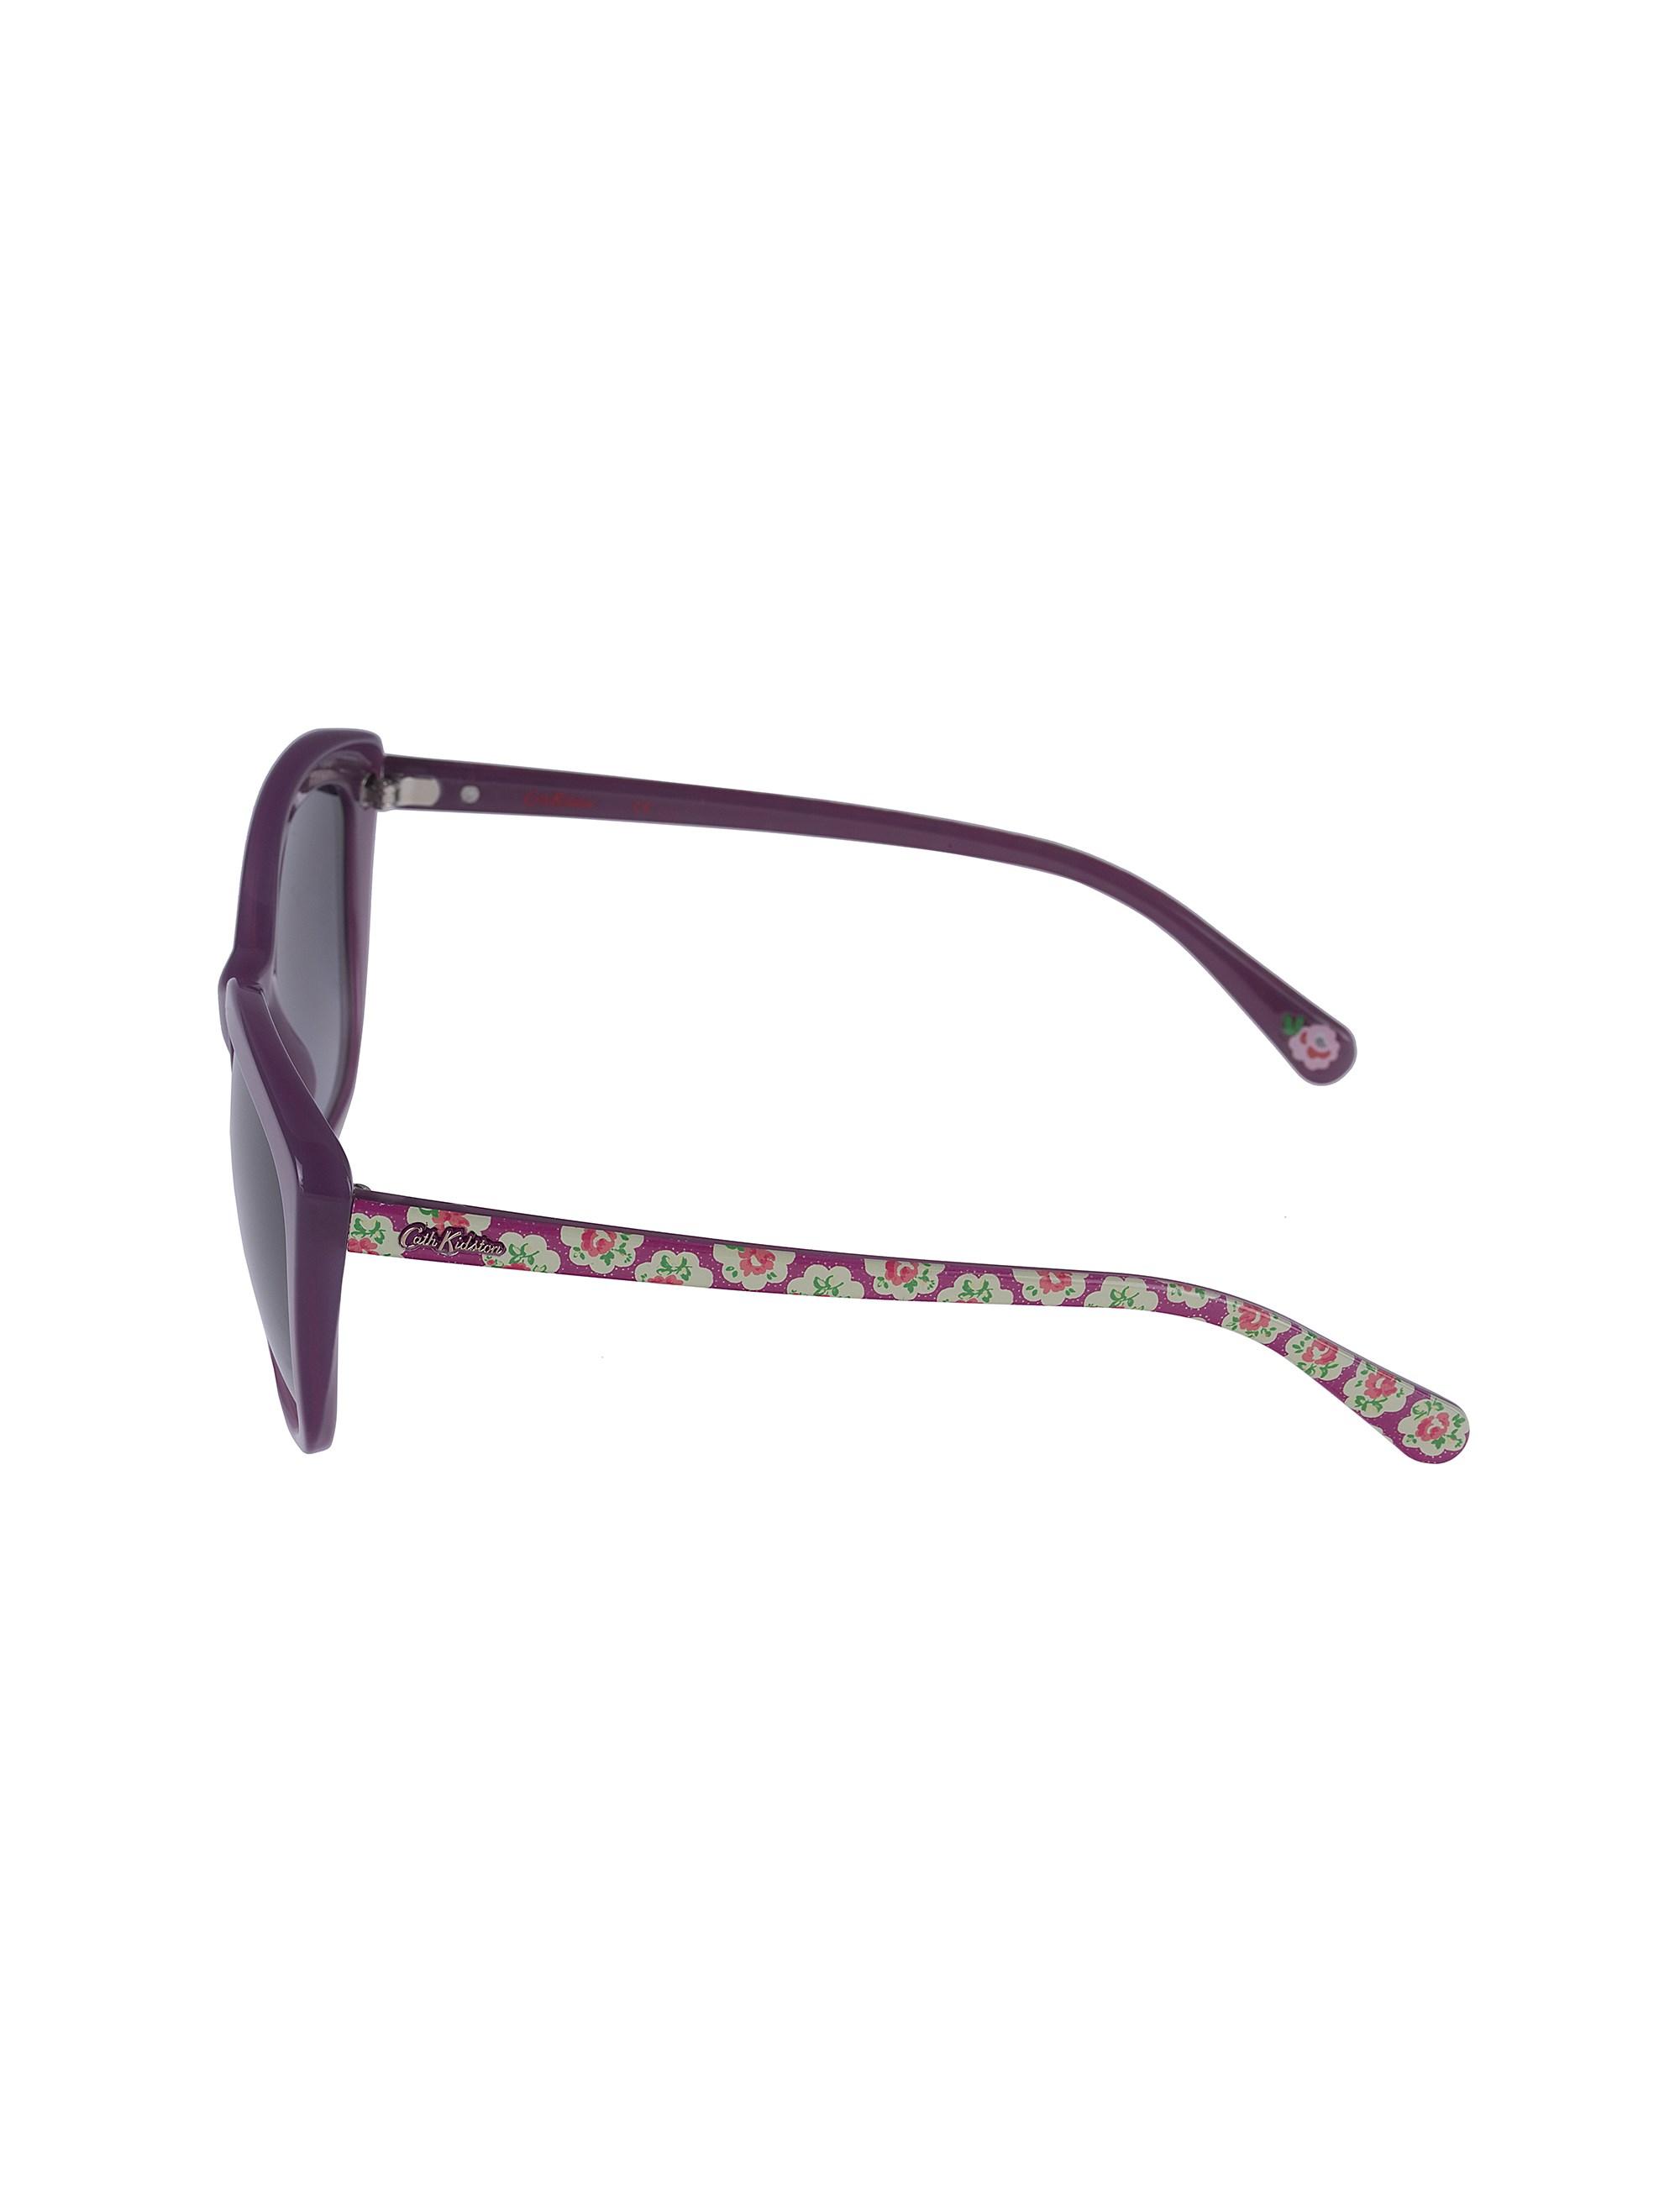 عینک آفتابی ویفرر زنانه - کت کیتسون